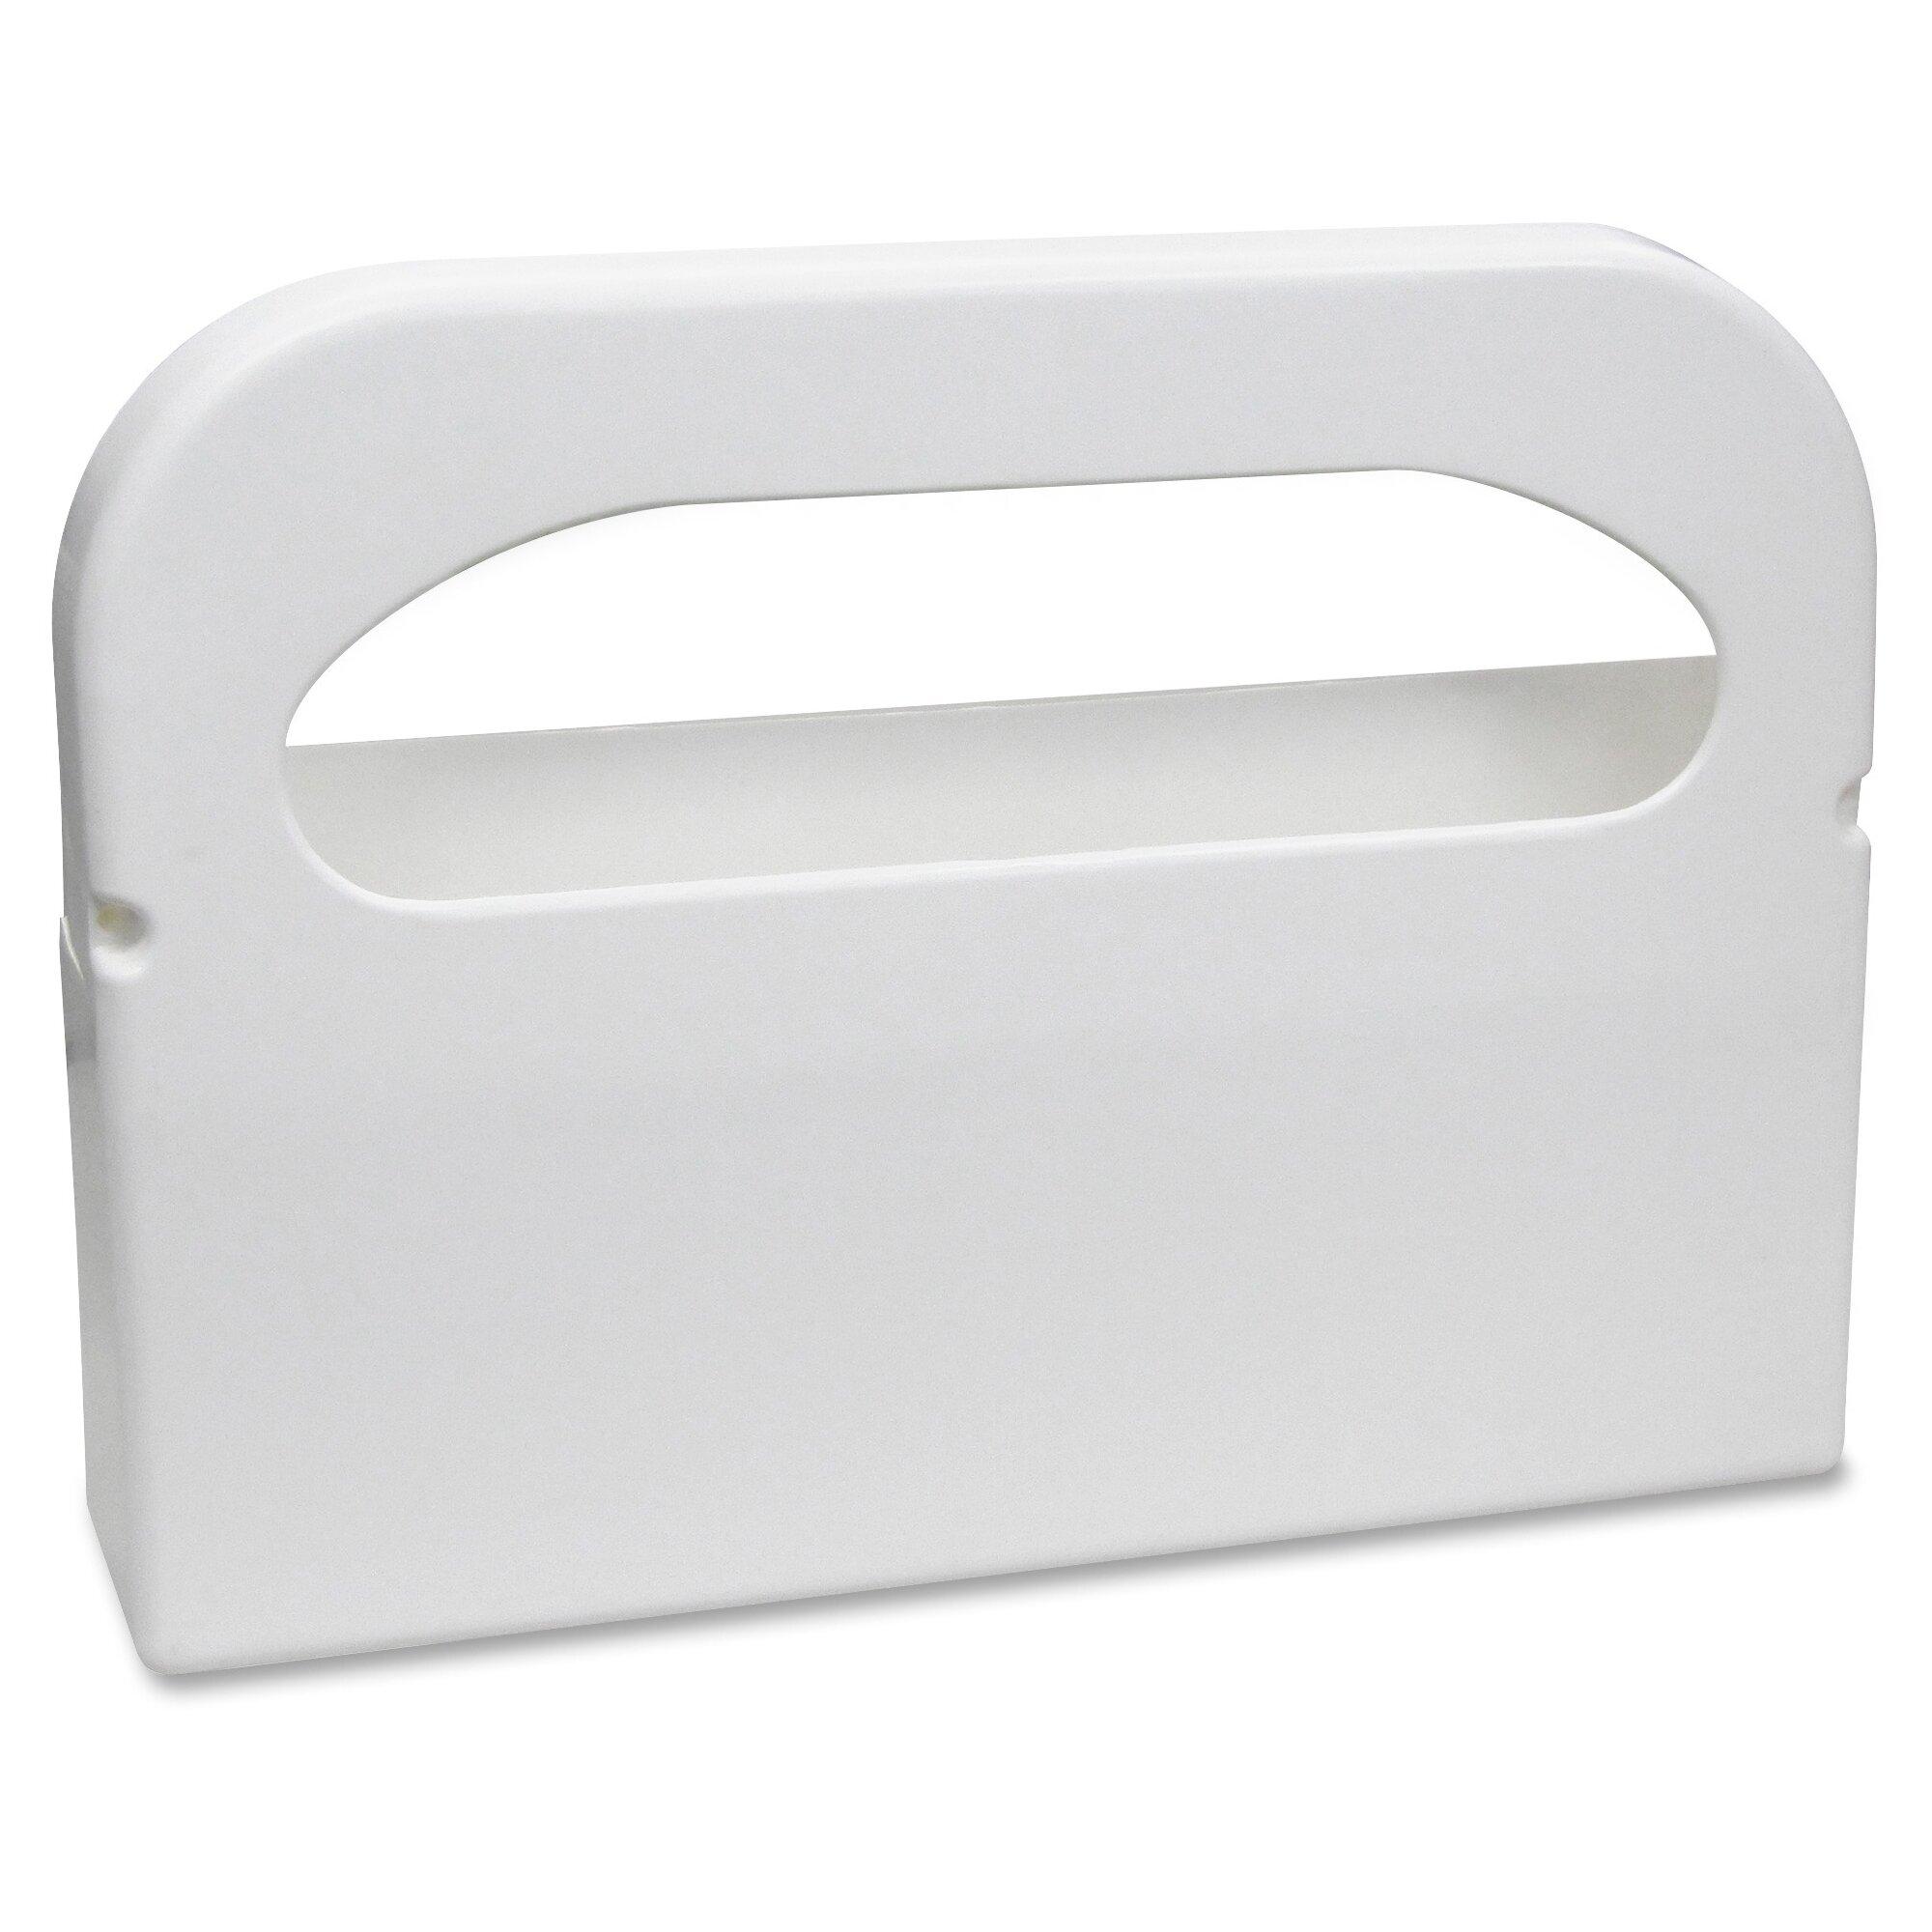 Surprising Hospeco Toilet Seat Cover Dispenser Machost Co Dining Chair Design Ideas Machostcouk